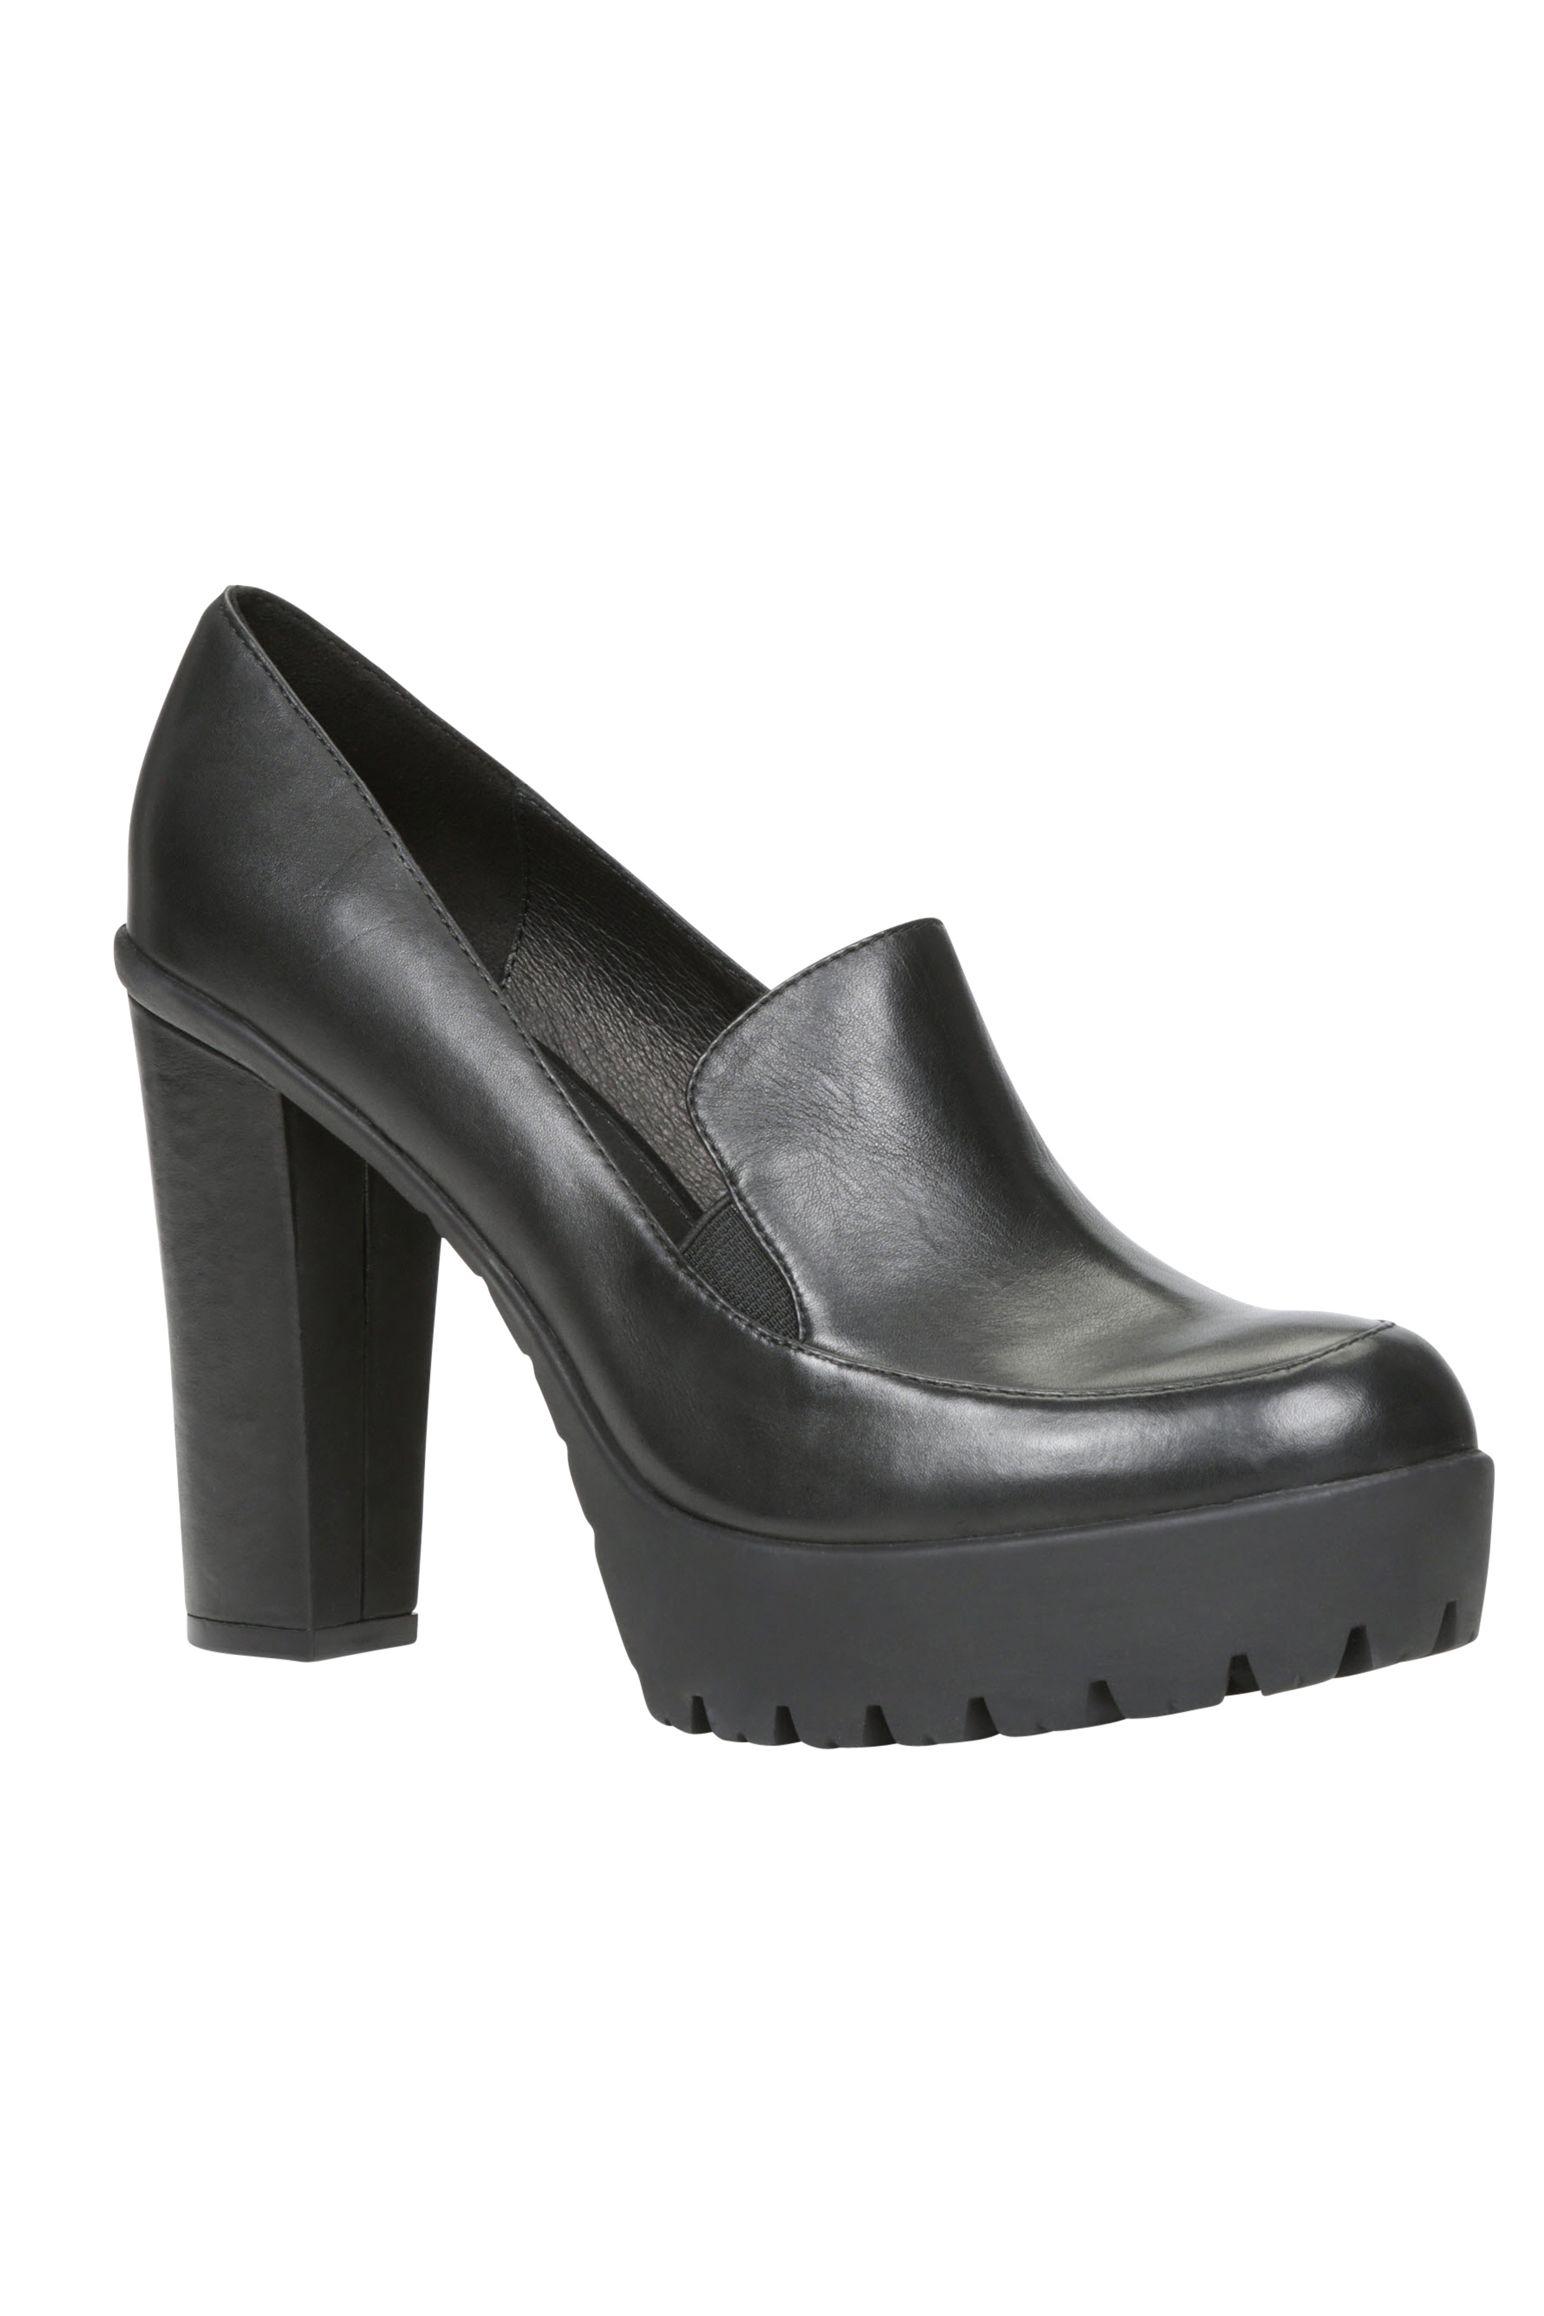 "Aldo Keren Pump, $50; <a href=""http://www.aldoshoes.com/us/en_US/women/shoes/high-heels/c/112/KEREN/p/34703601-97"">aldoshoes.com </a>"